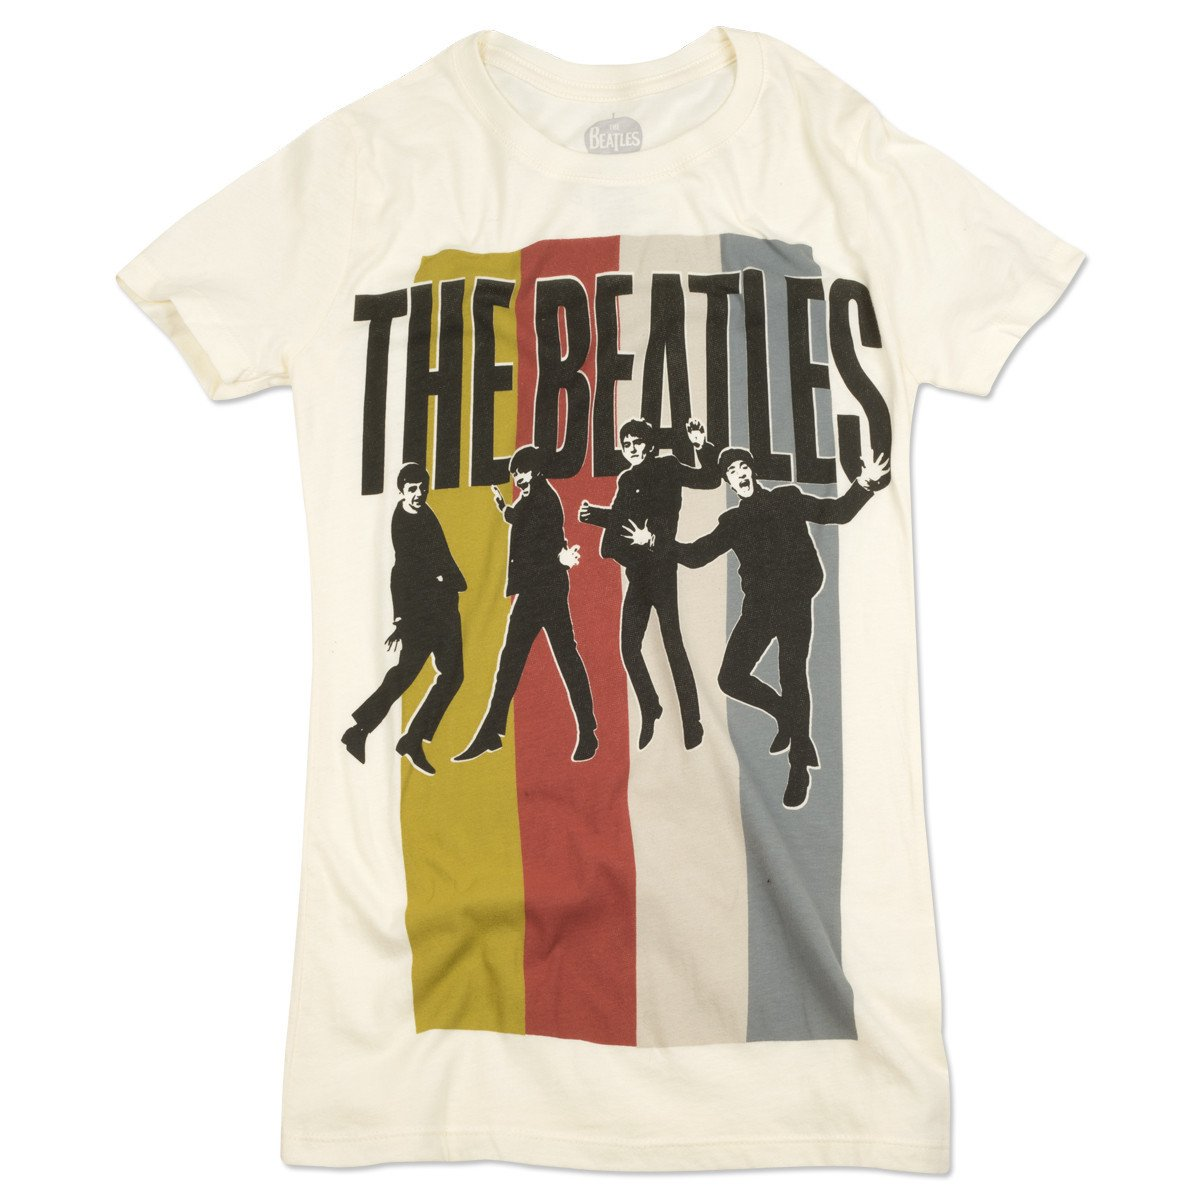 Stripes Standing Group Junior's T-Shirt